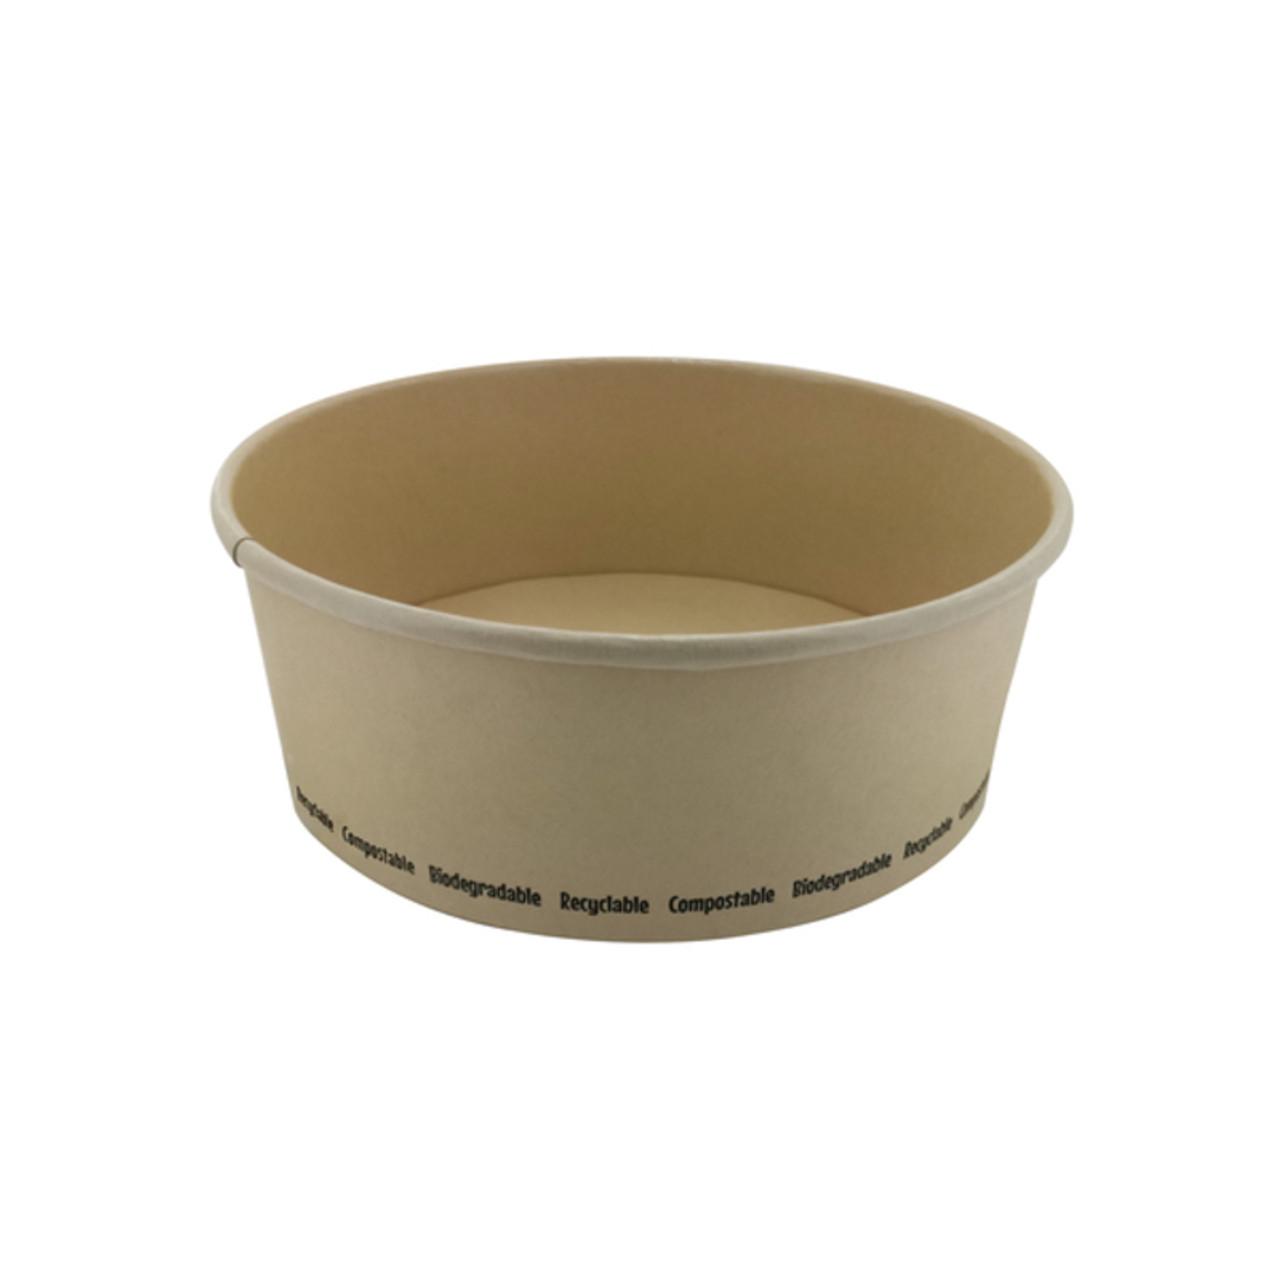 Compostable Round Bamboo Fiber Buckaty Salad Box -25oz Dia:5.85in H:2.38in